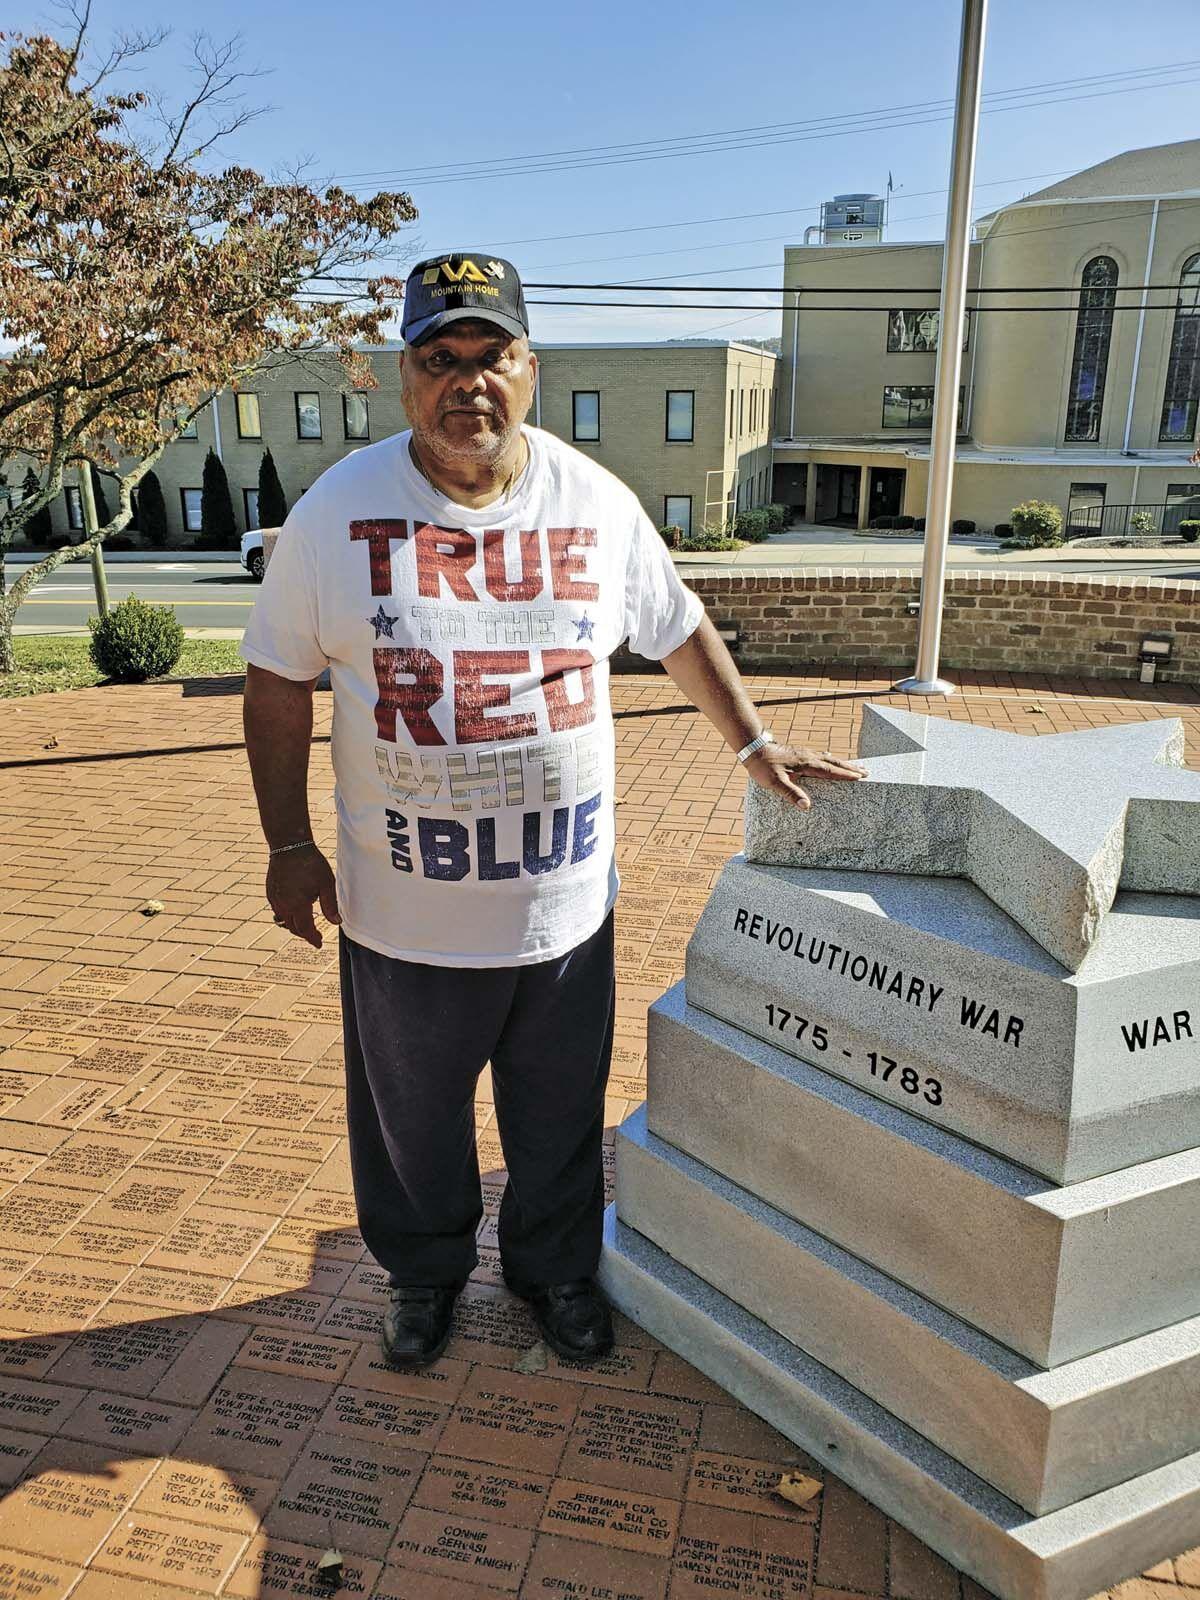 William Isom:: An American veteran's story